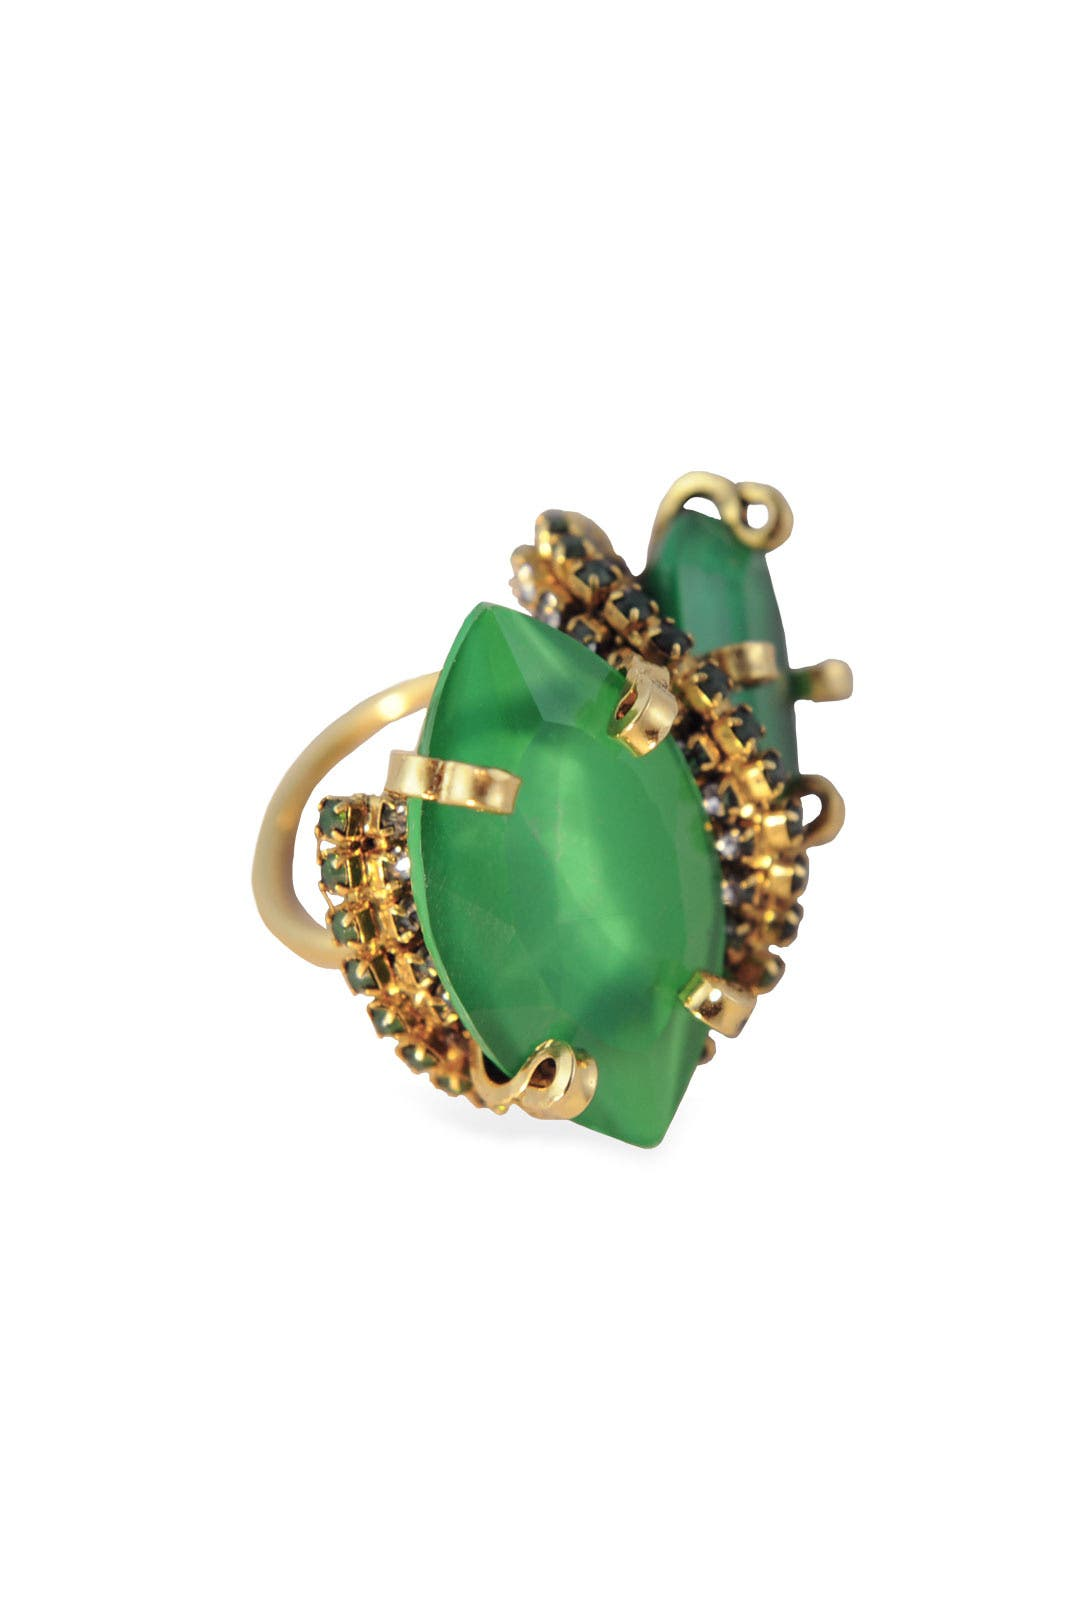 Bette Davis Eyes Emerald Ring by Erickson Beamon